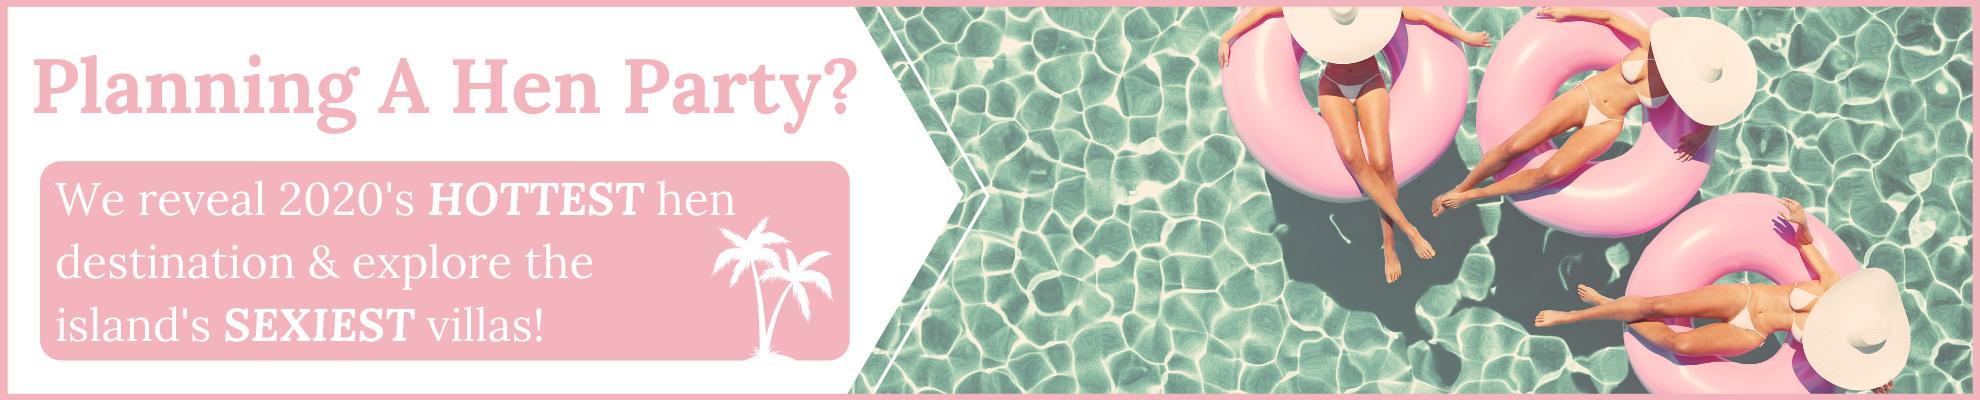 Love-Island-Hen-Party-Slide